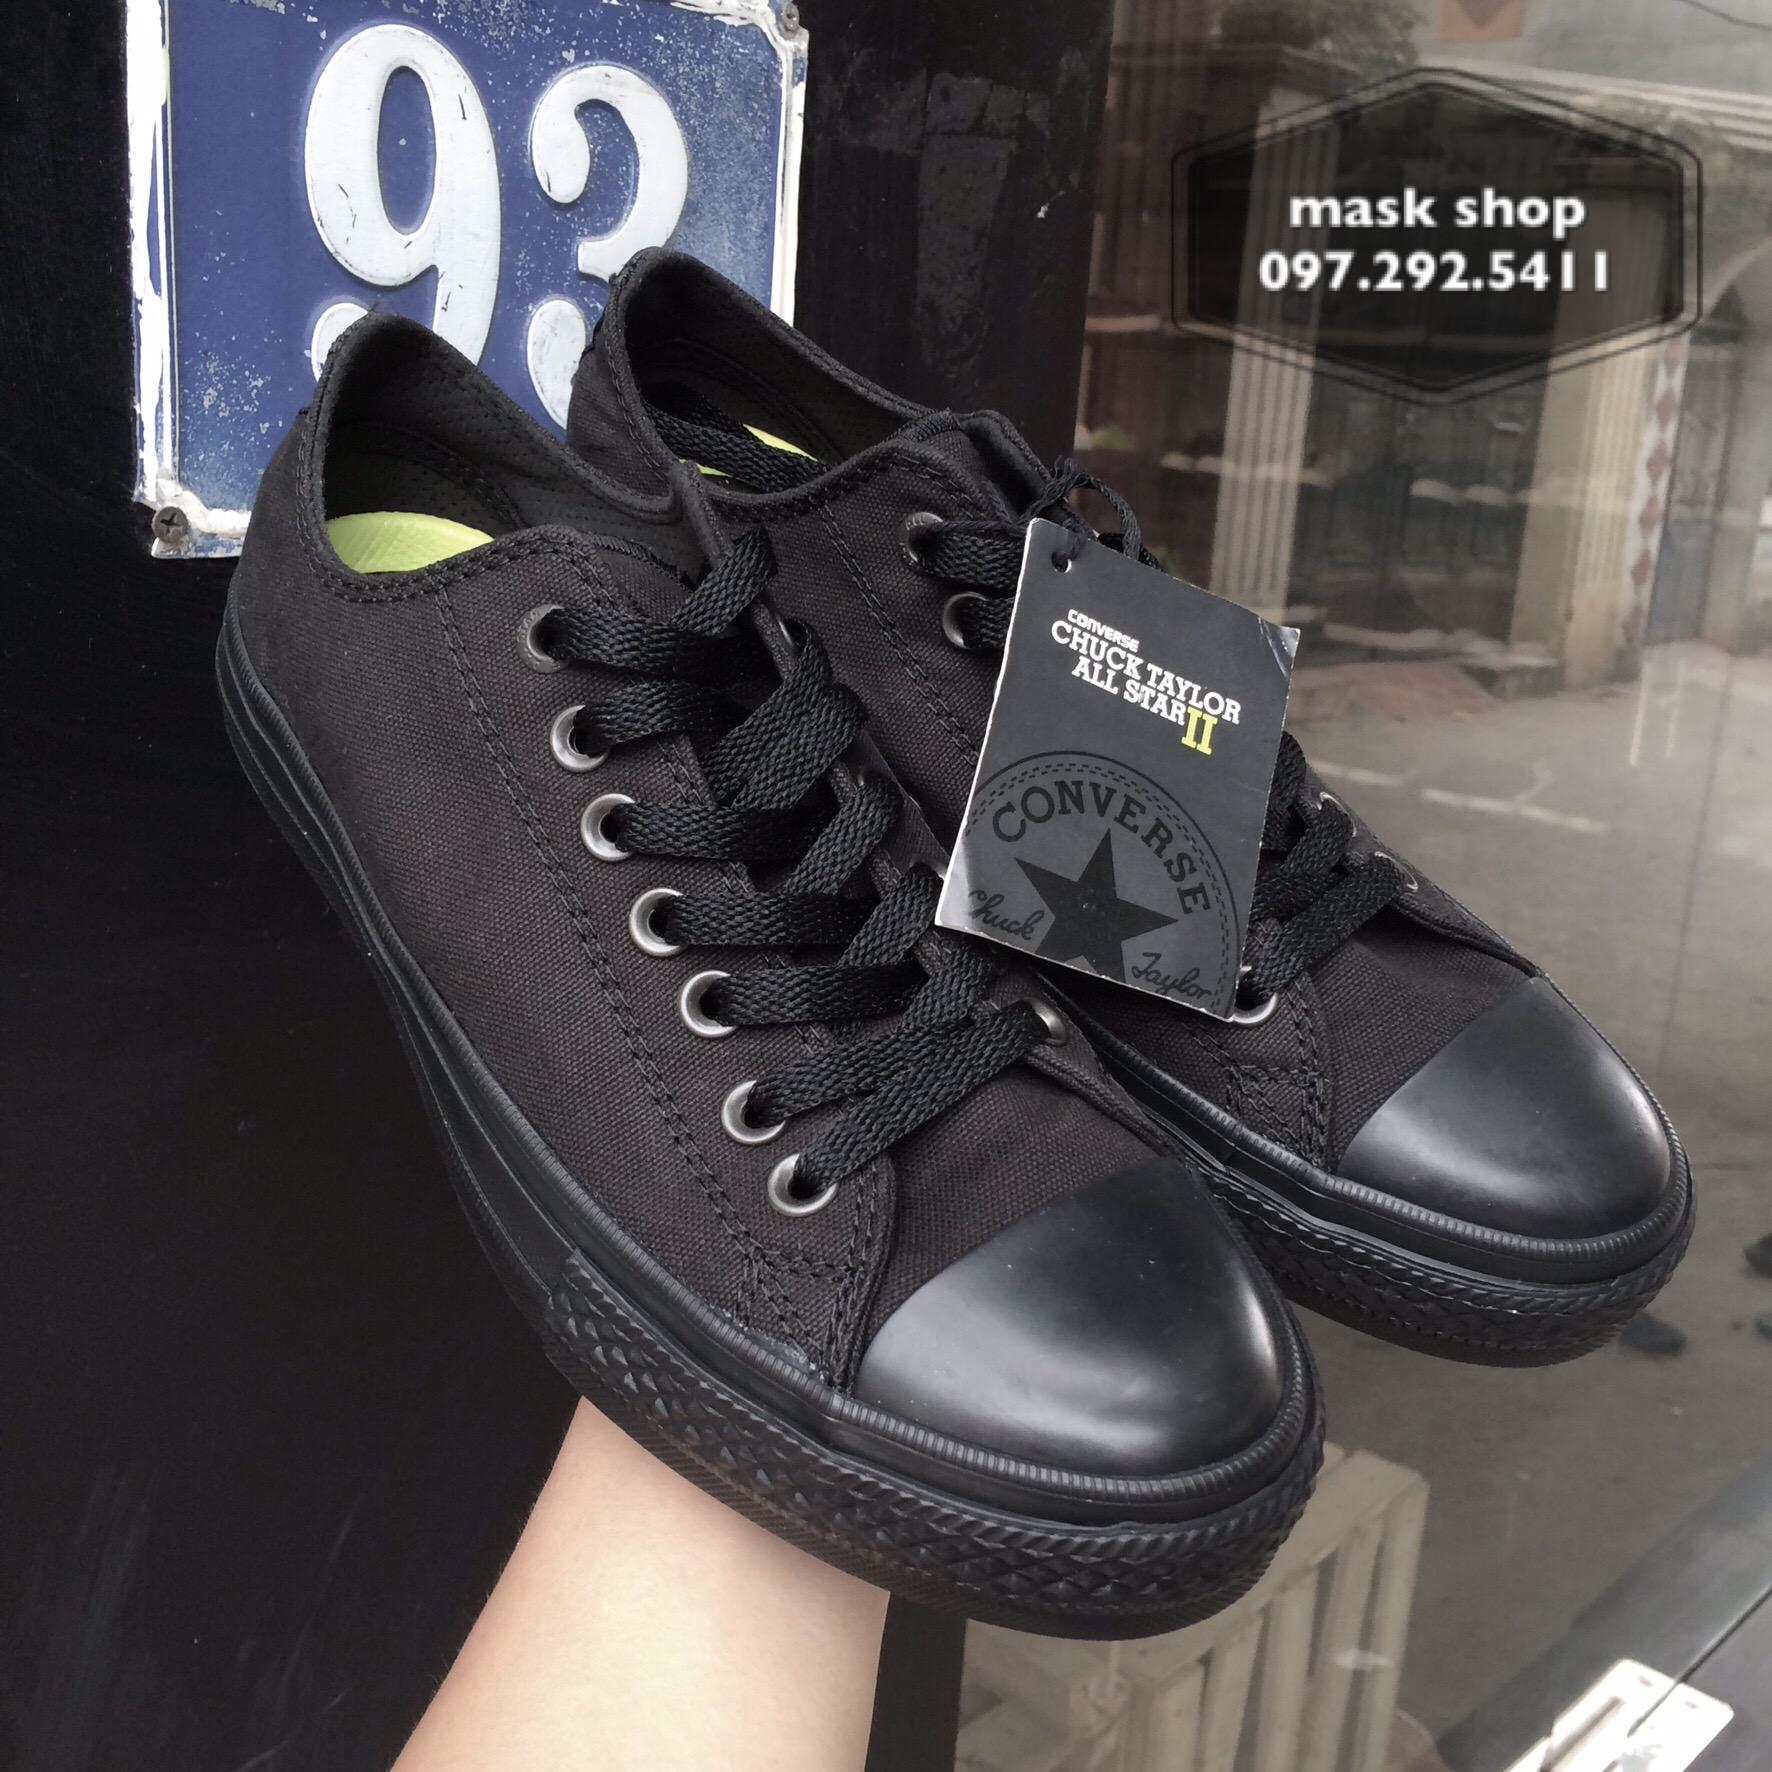 converse chuck 2 full black